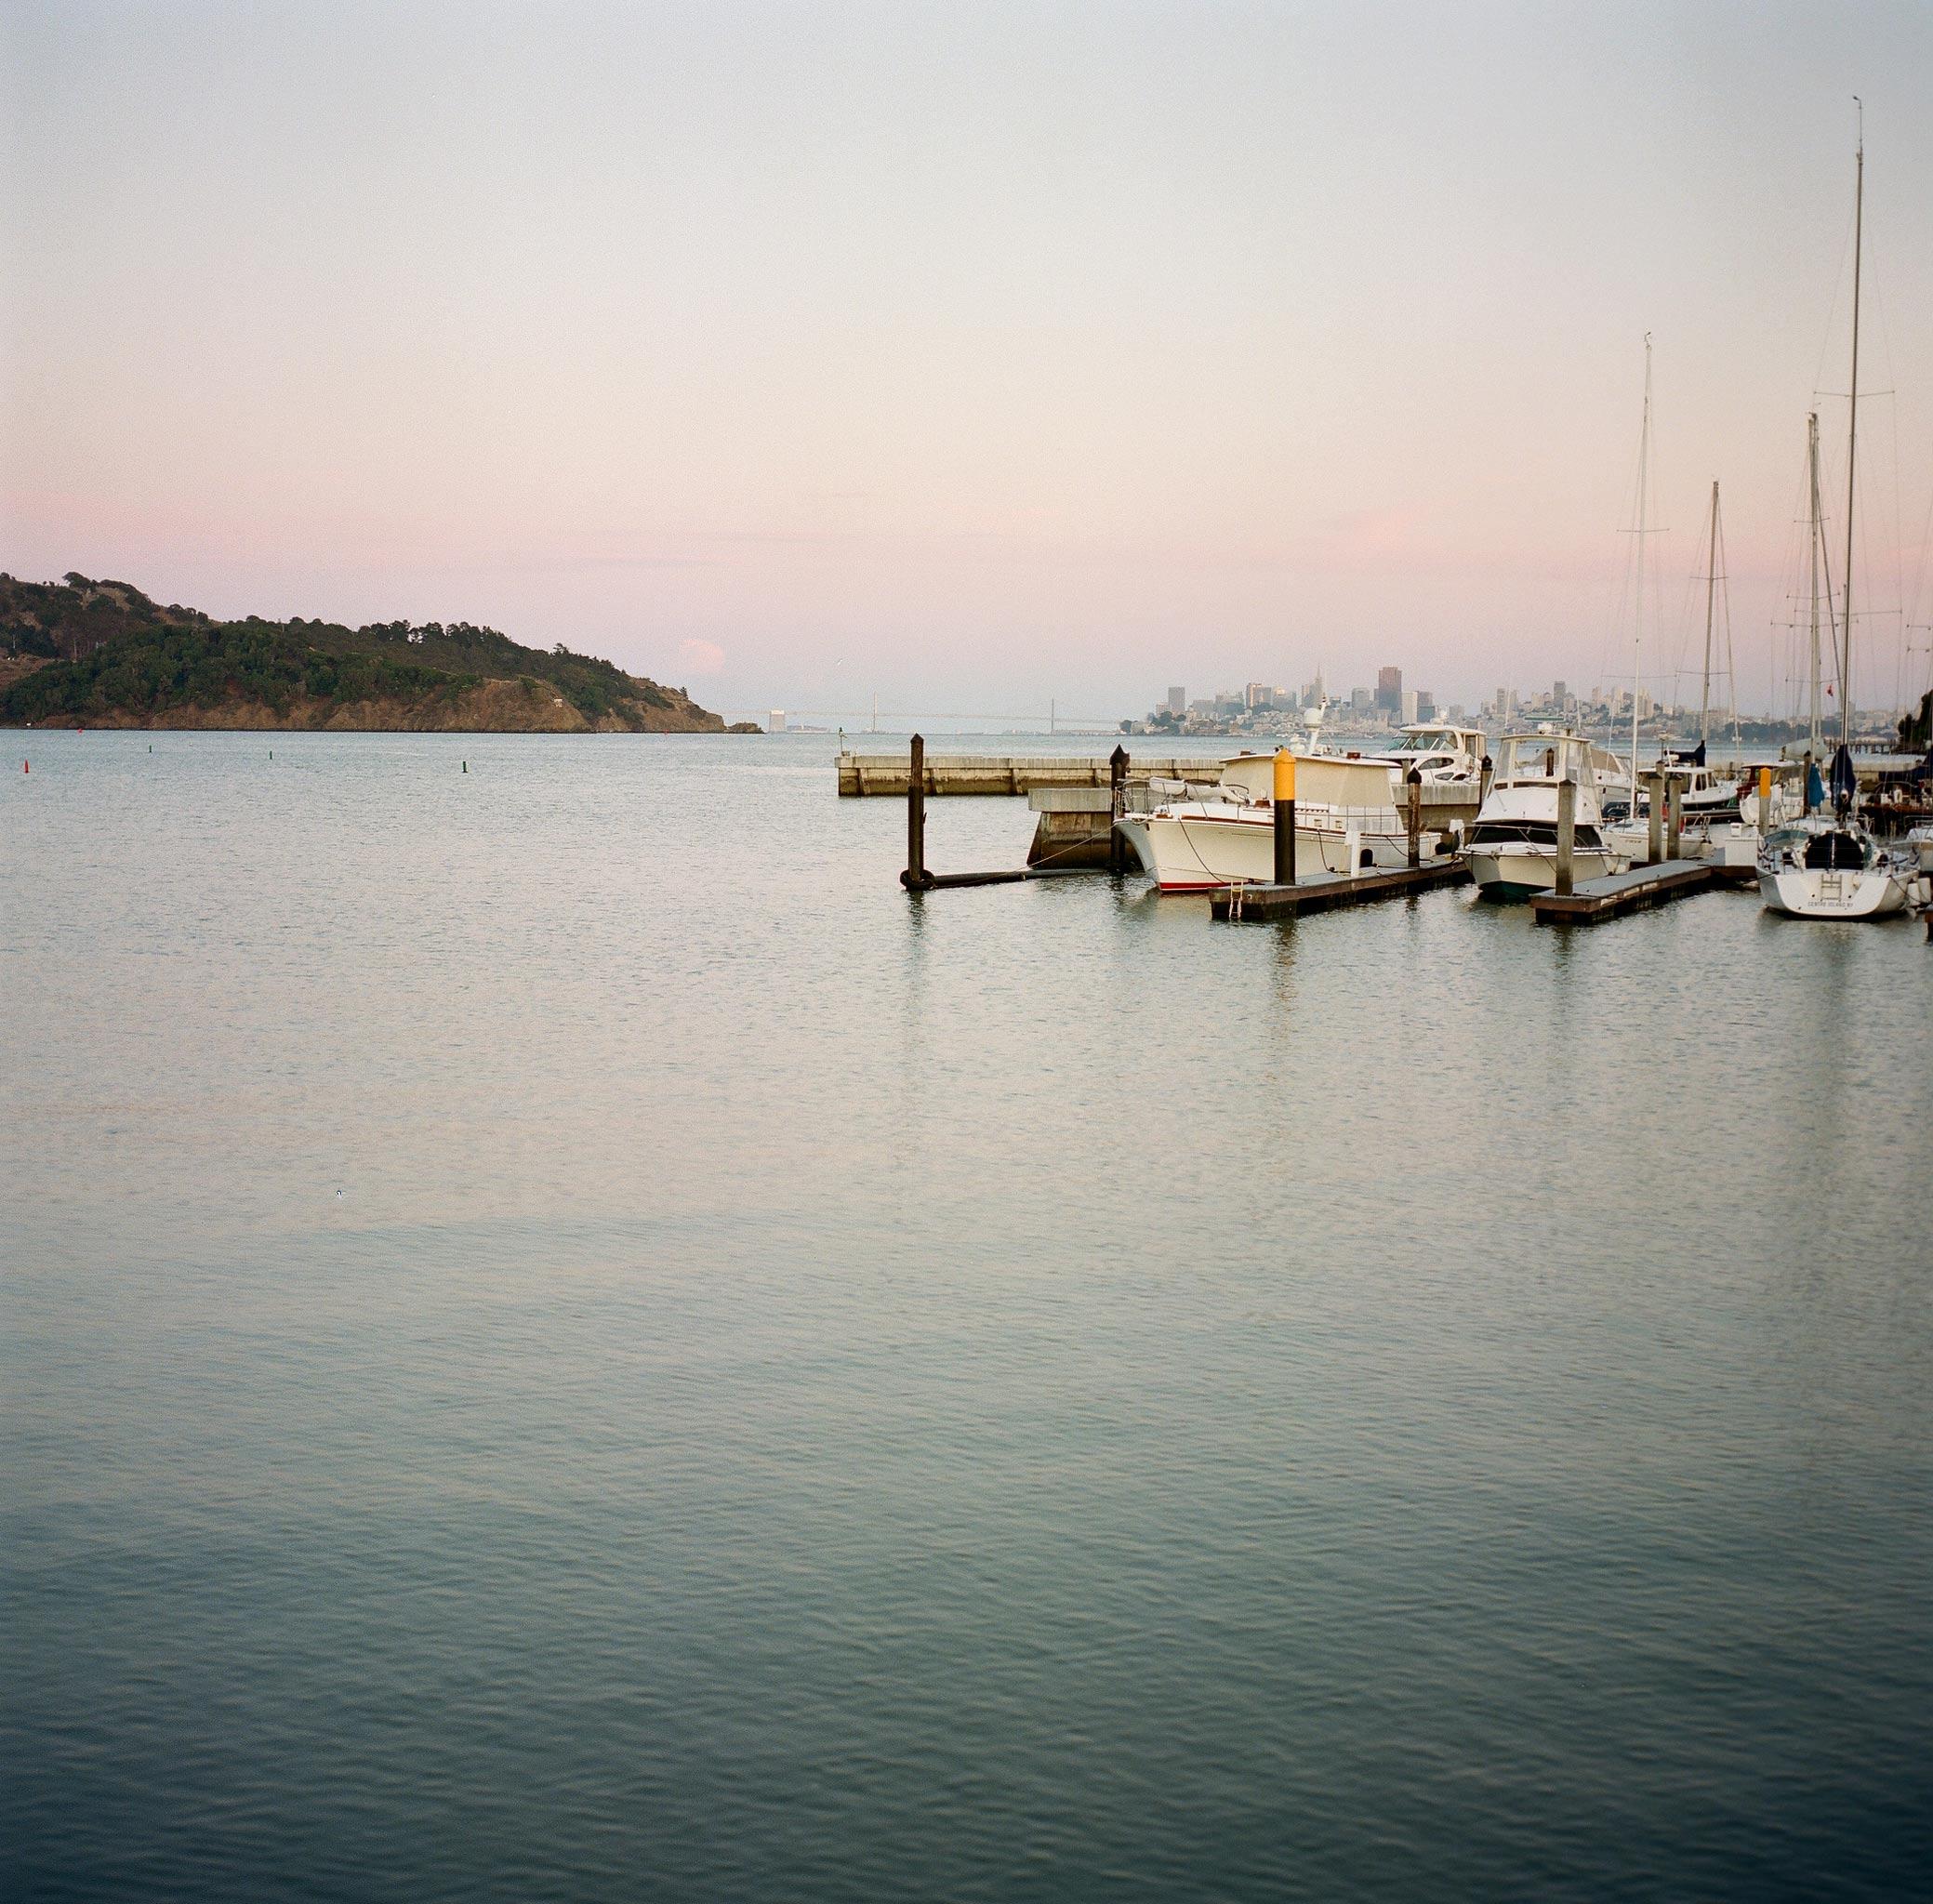 Views of the Tiburon harbor and the San Francisco Bay from China Cabin.